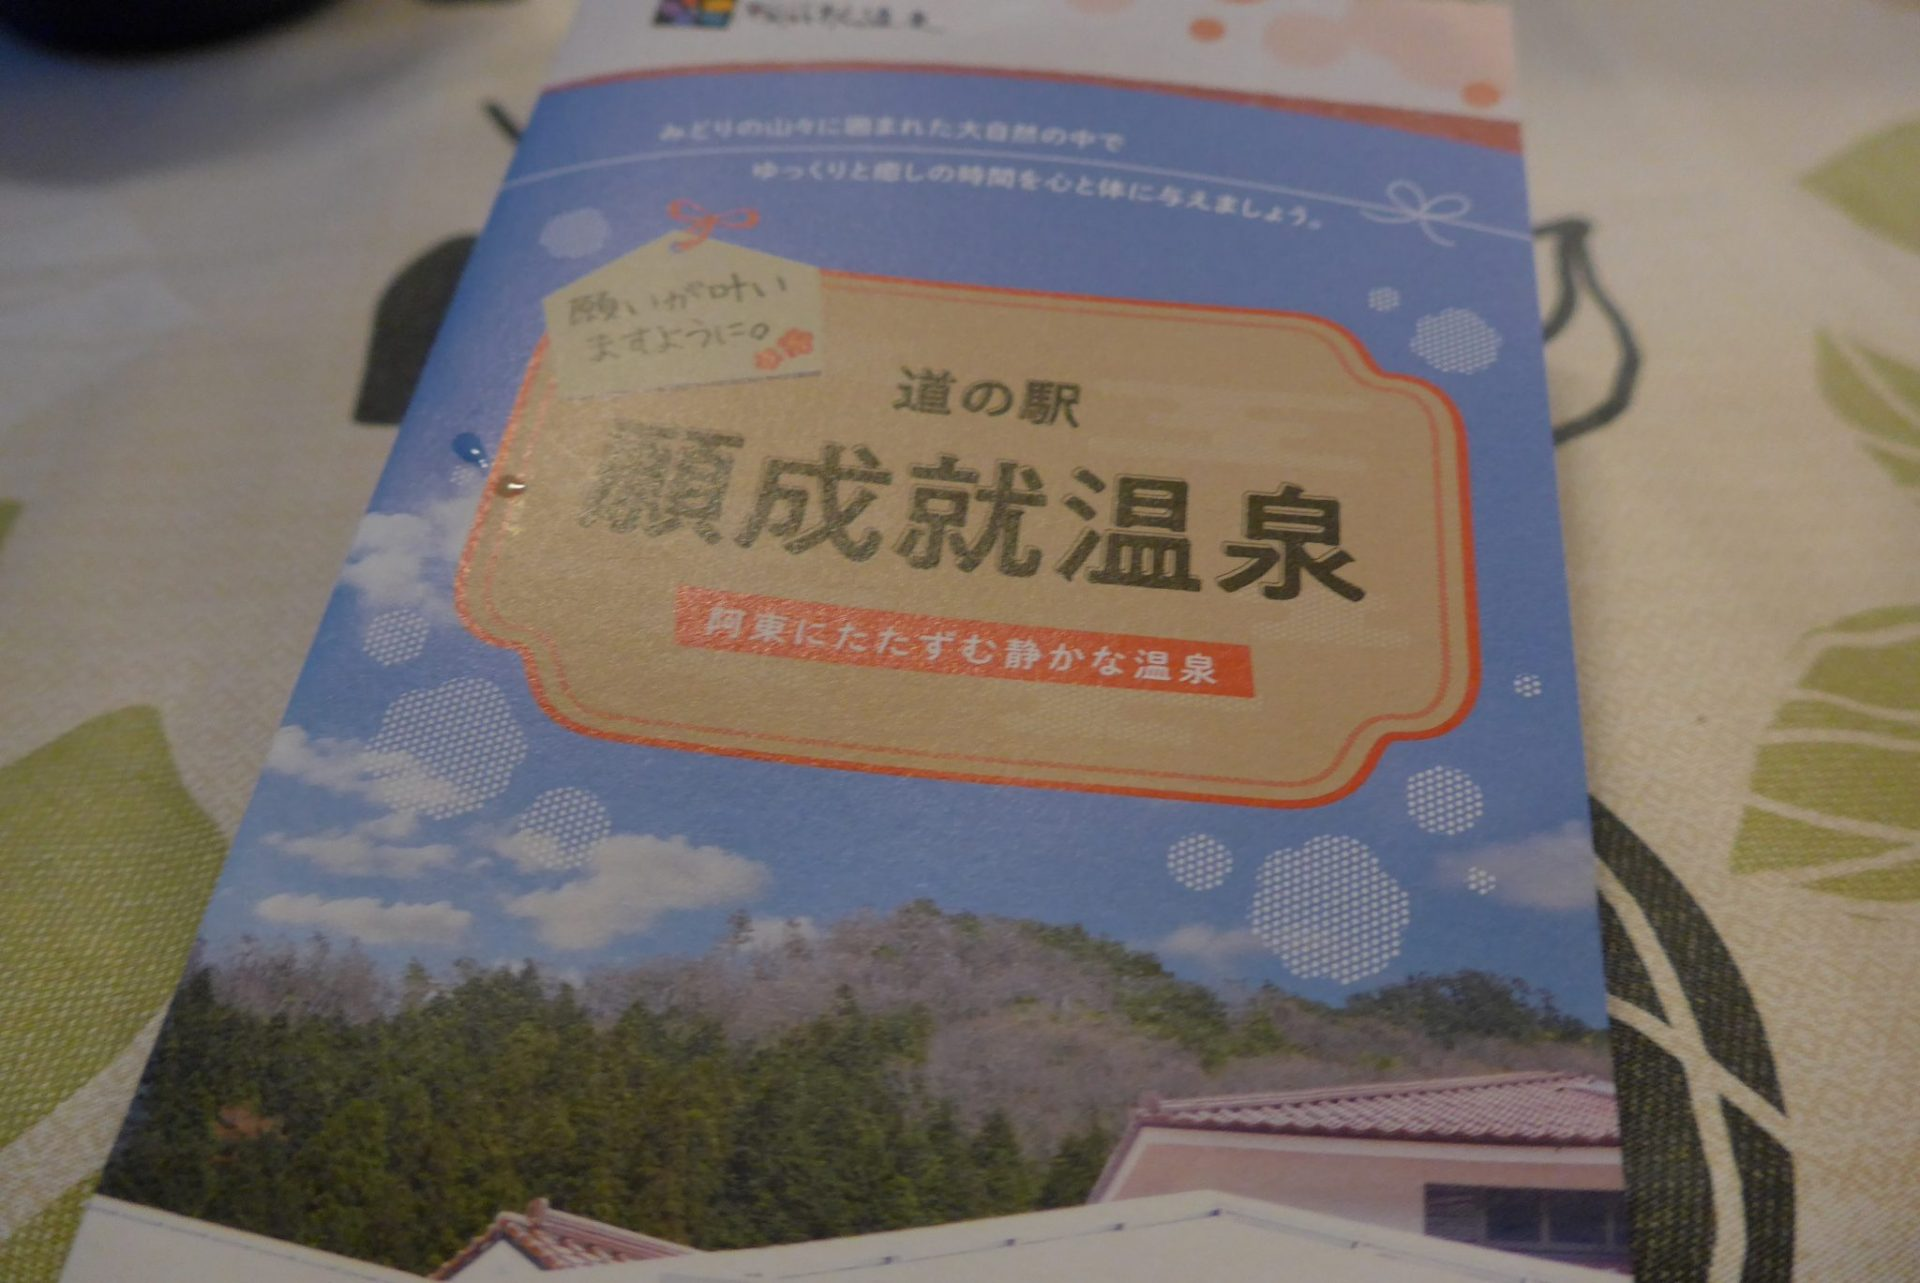 (K)道の駅願成就温泉の車中泊〜綺麗なトイレと充実した天然温泉〜